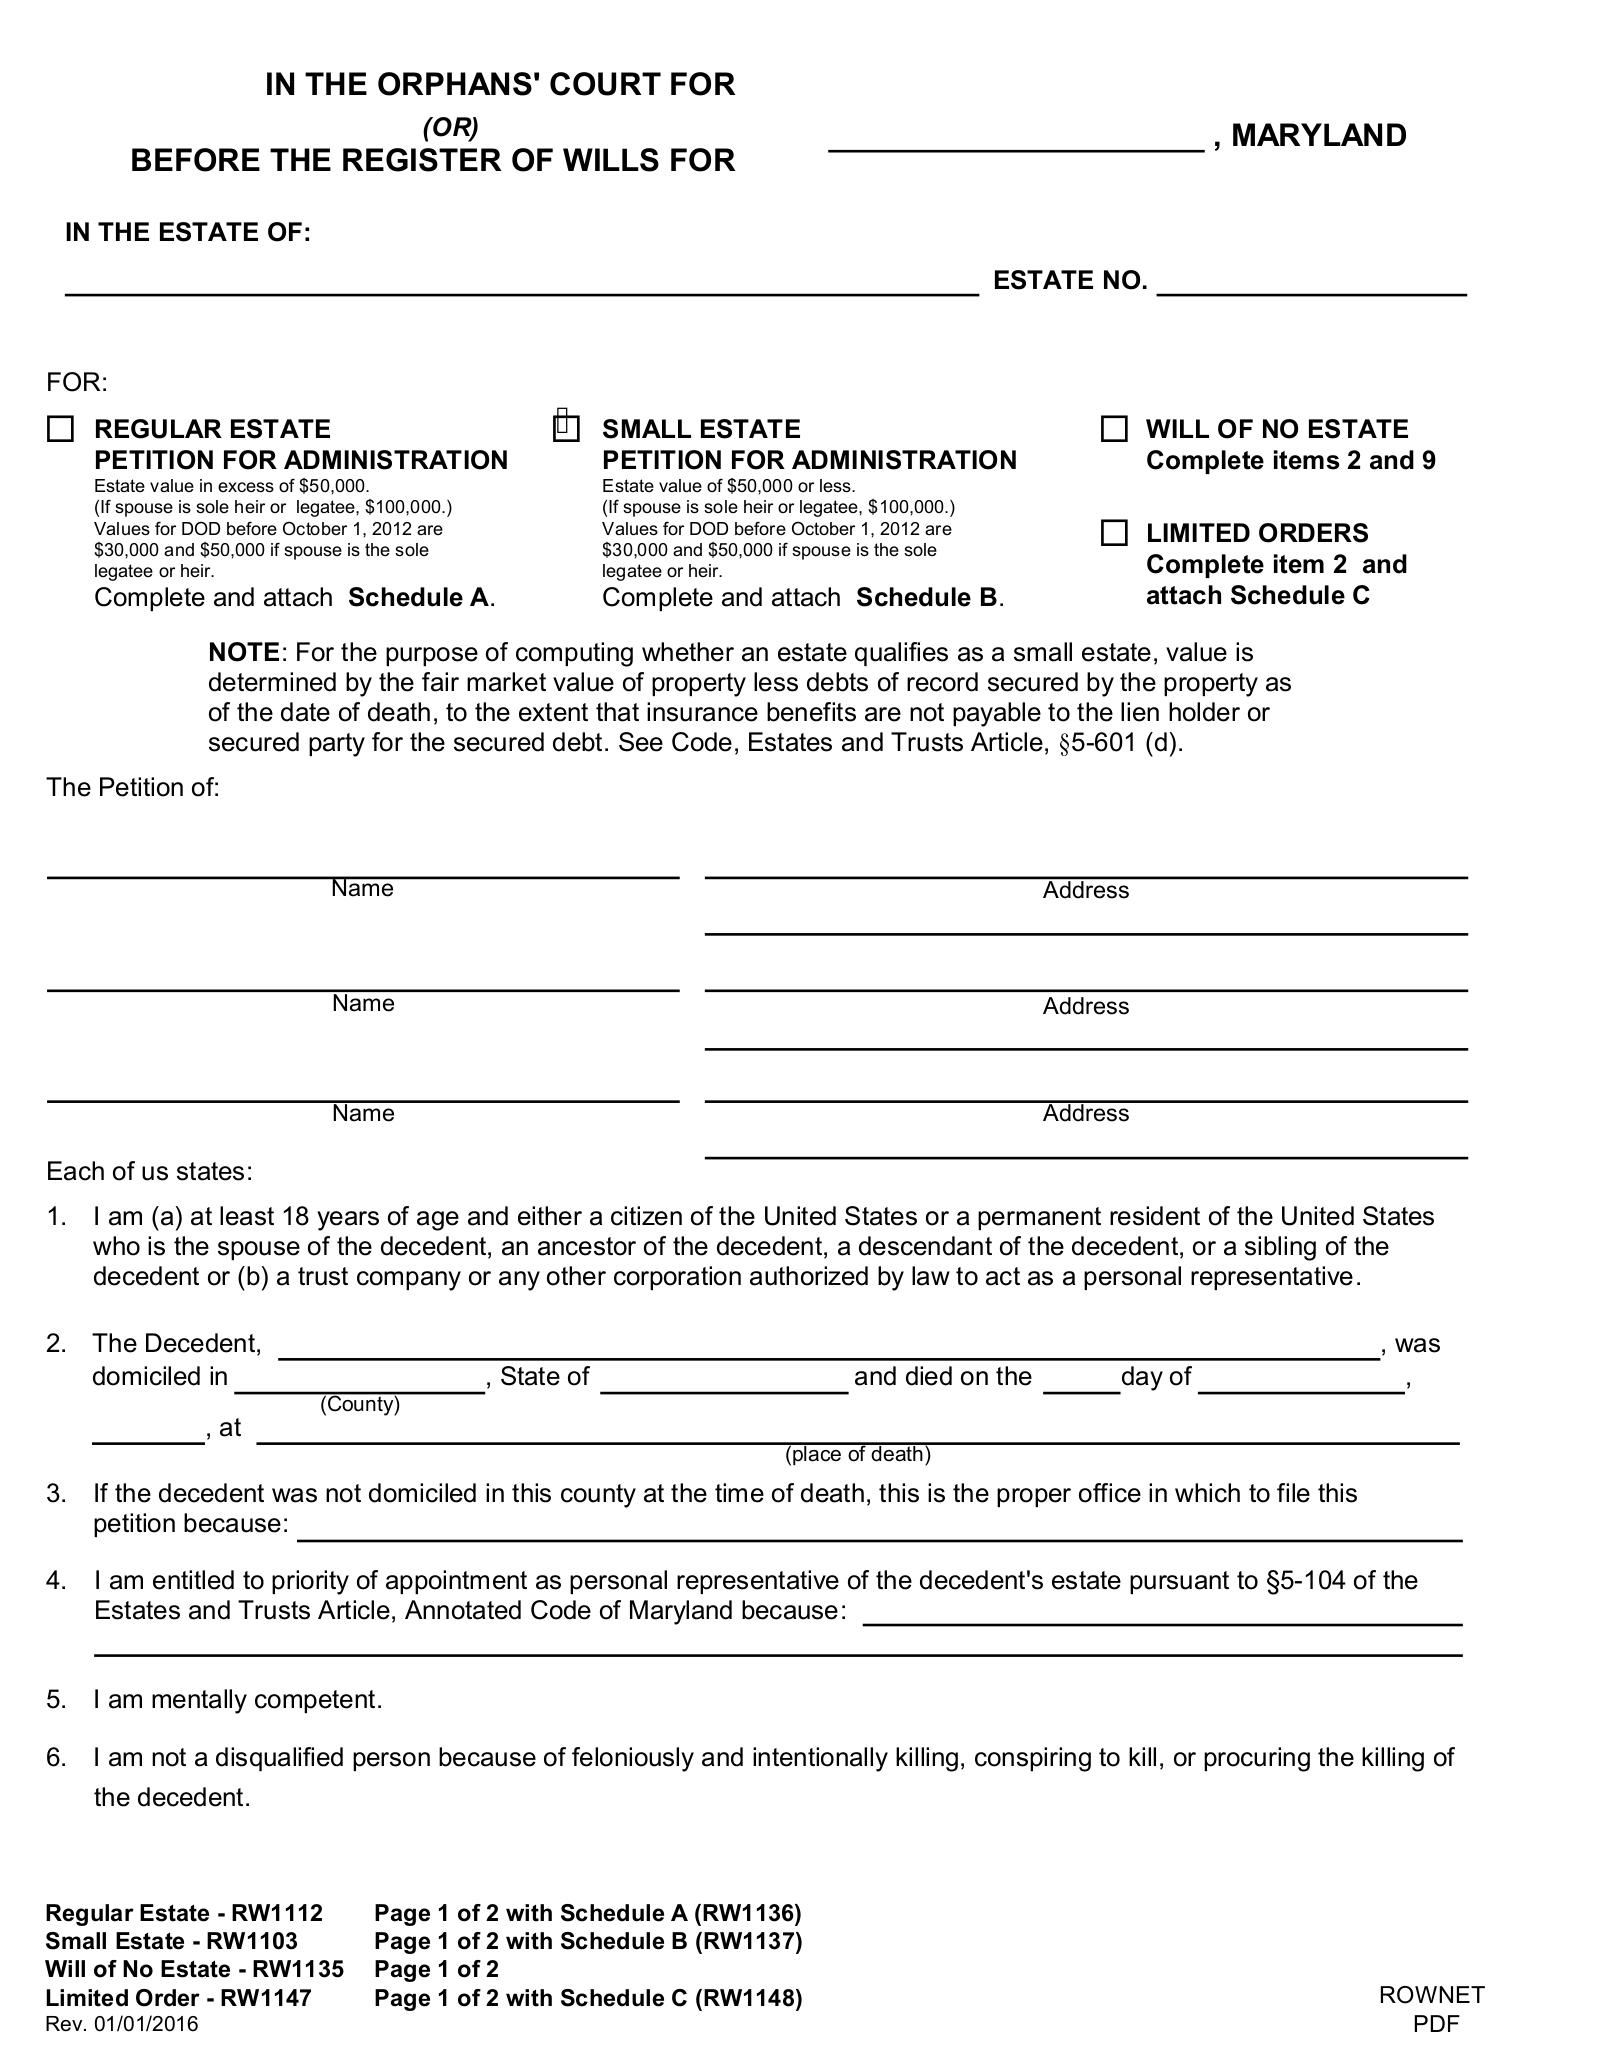 Free Maryland Small Estate Affidavit   Form RW30   PDF – eForms